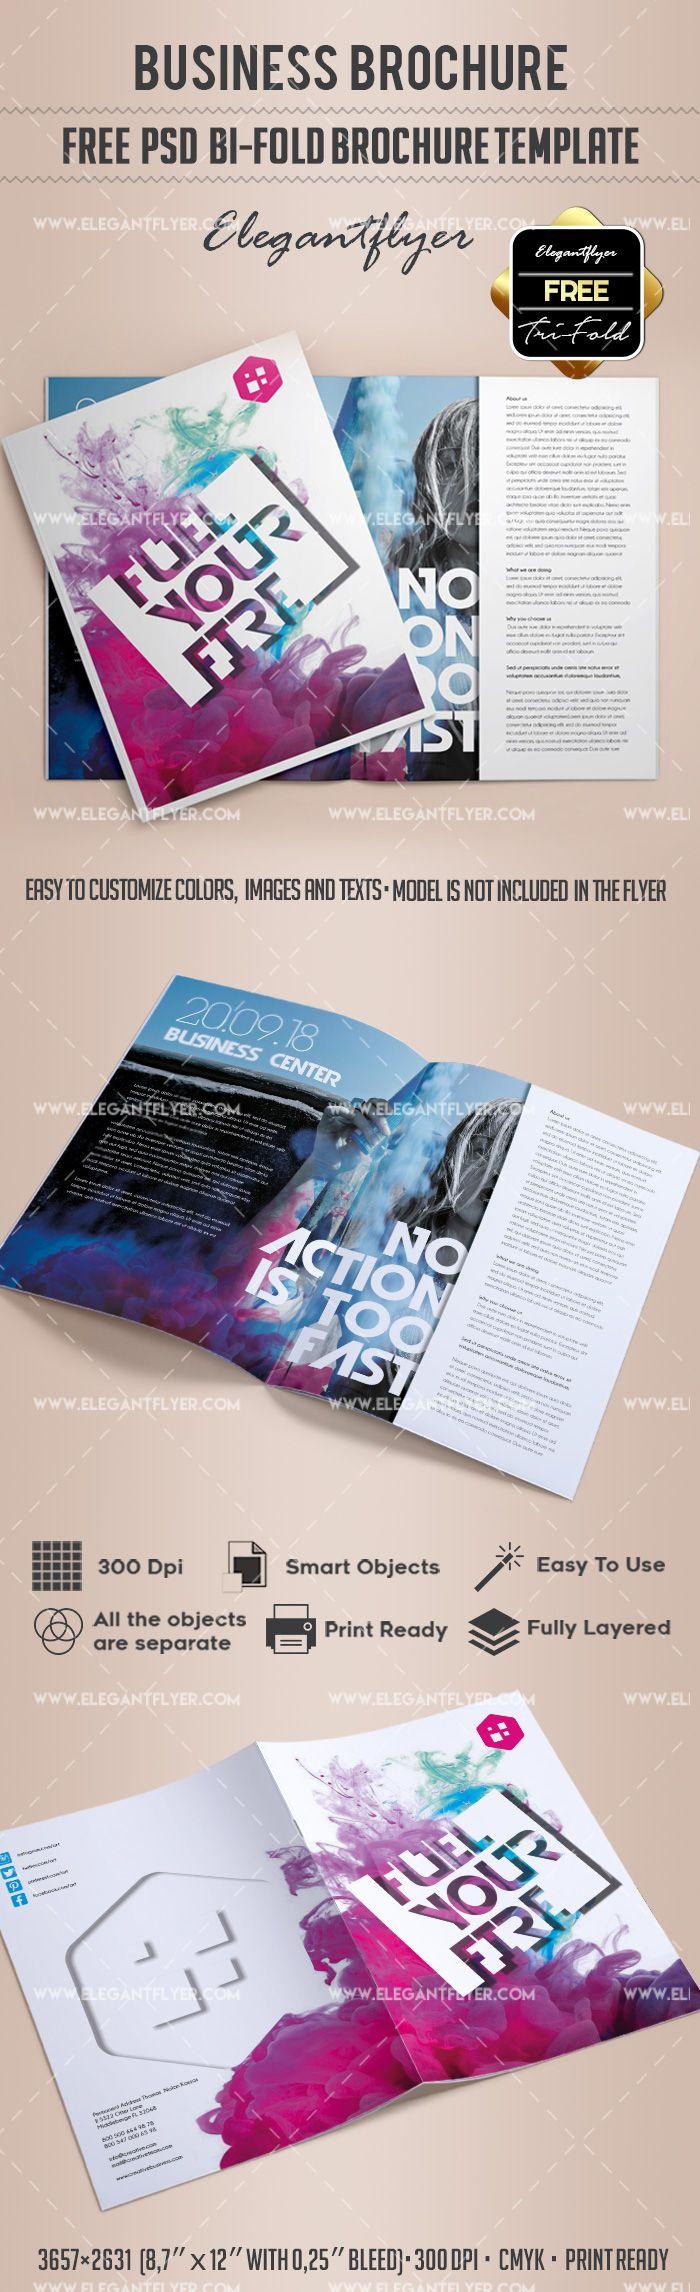 Business Free Bi Fold Brochure Psd Template Free Brochure